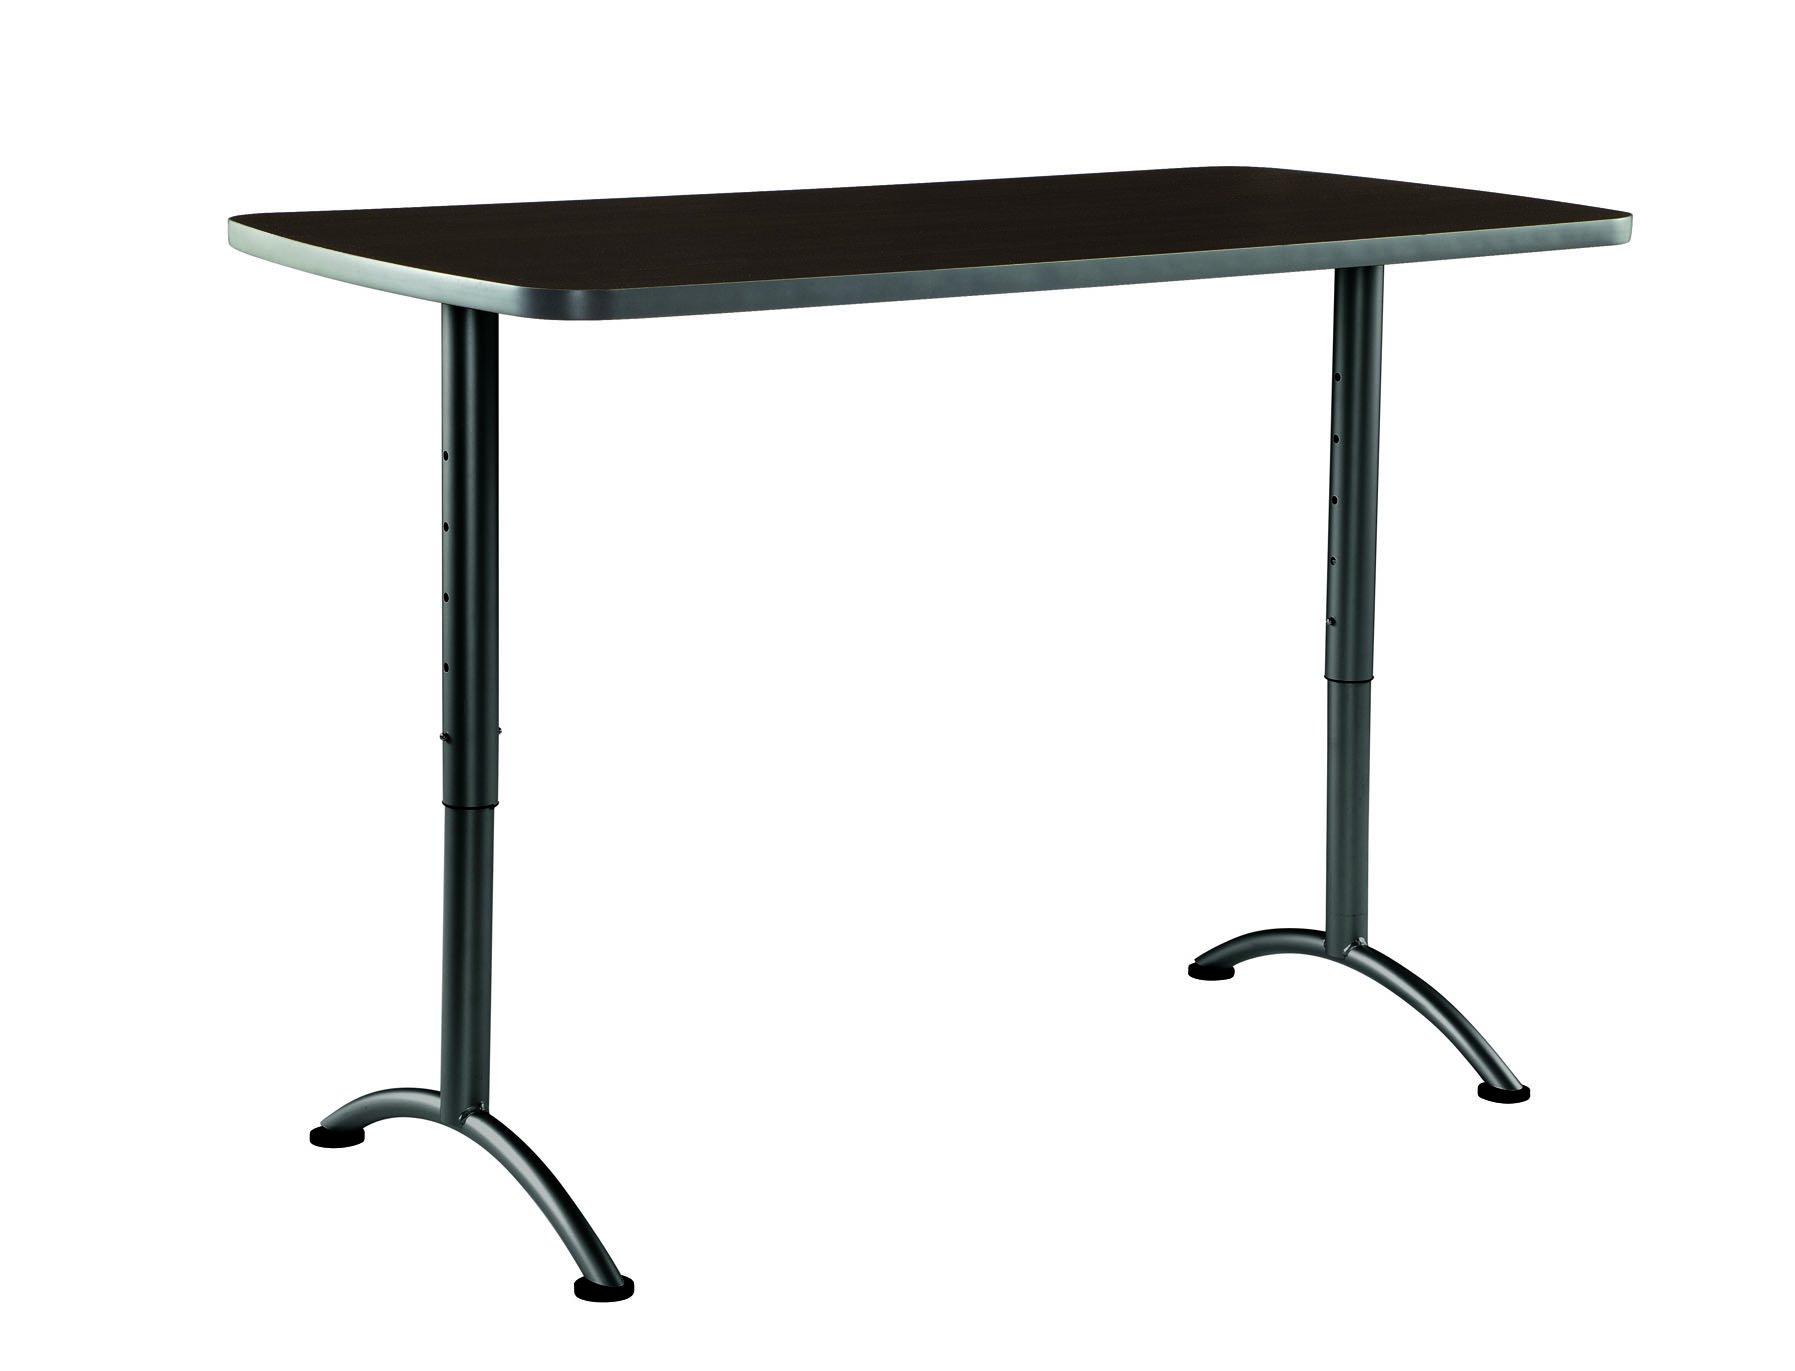 Iceberg ICE69314 ARC 5-foot Adjustable Height Rectangular Conference Table, 30'' x 60'', Walnut/Gray Leg